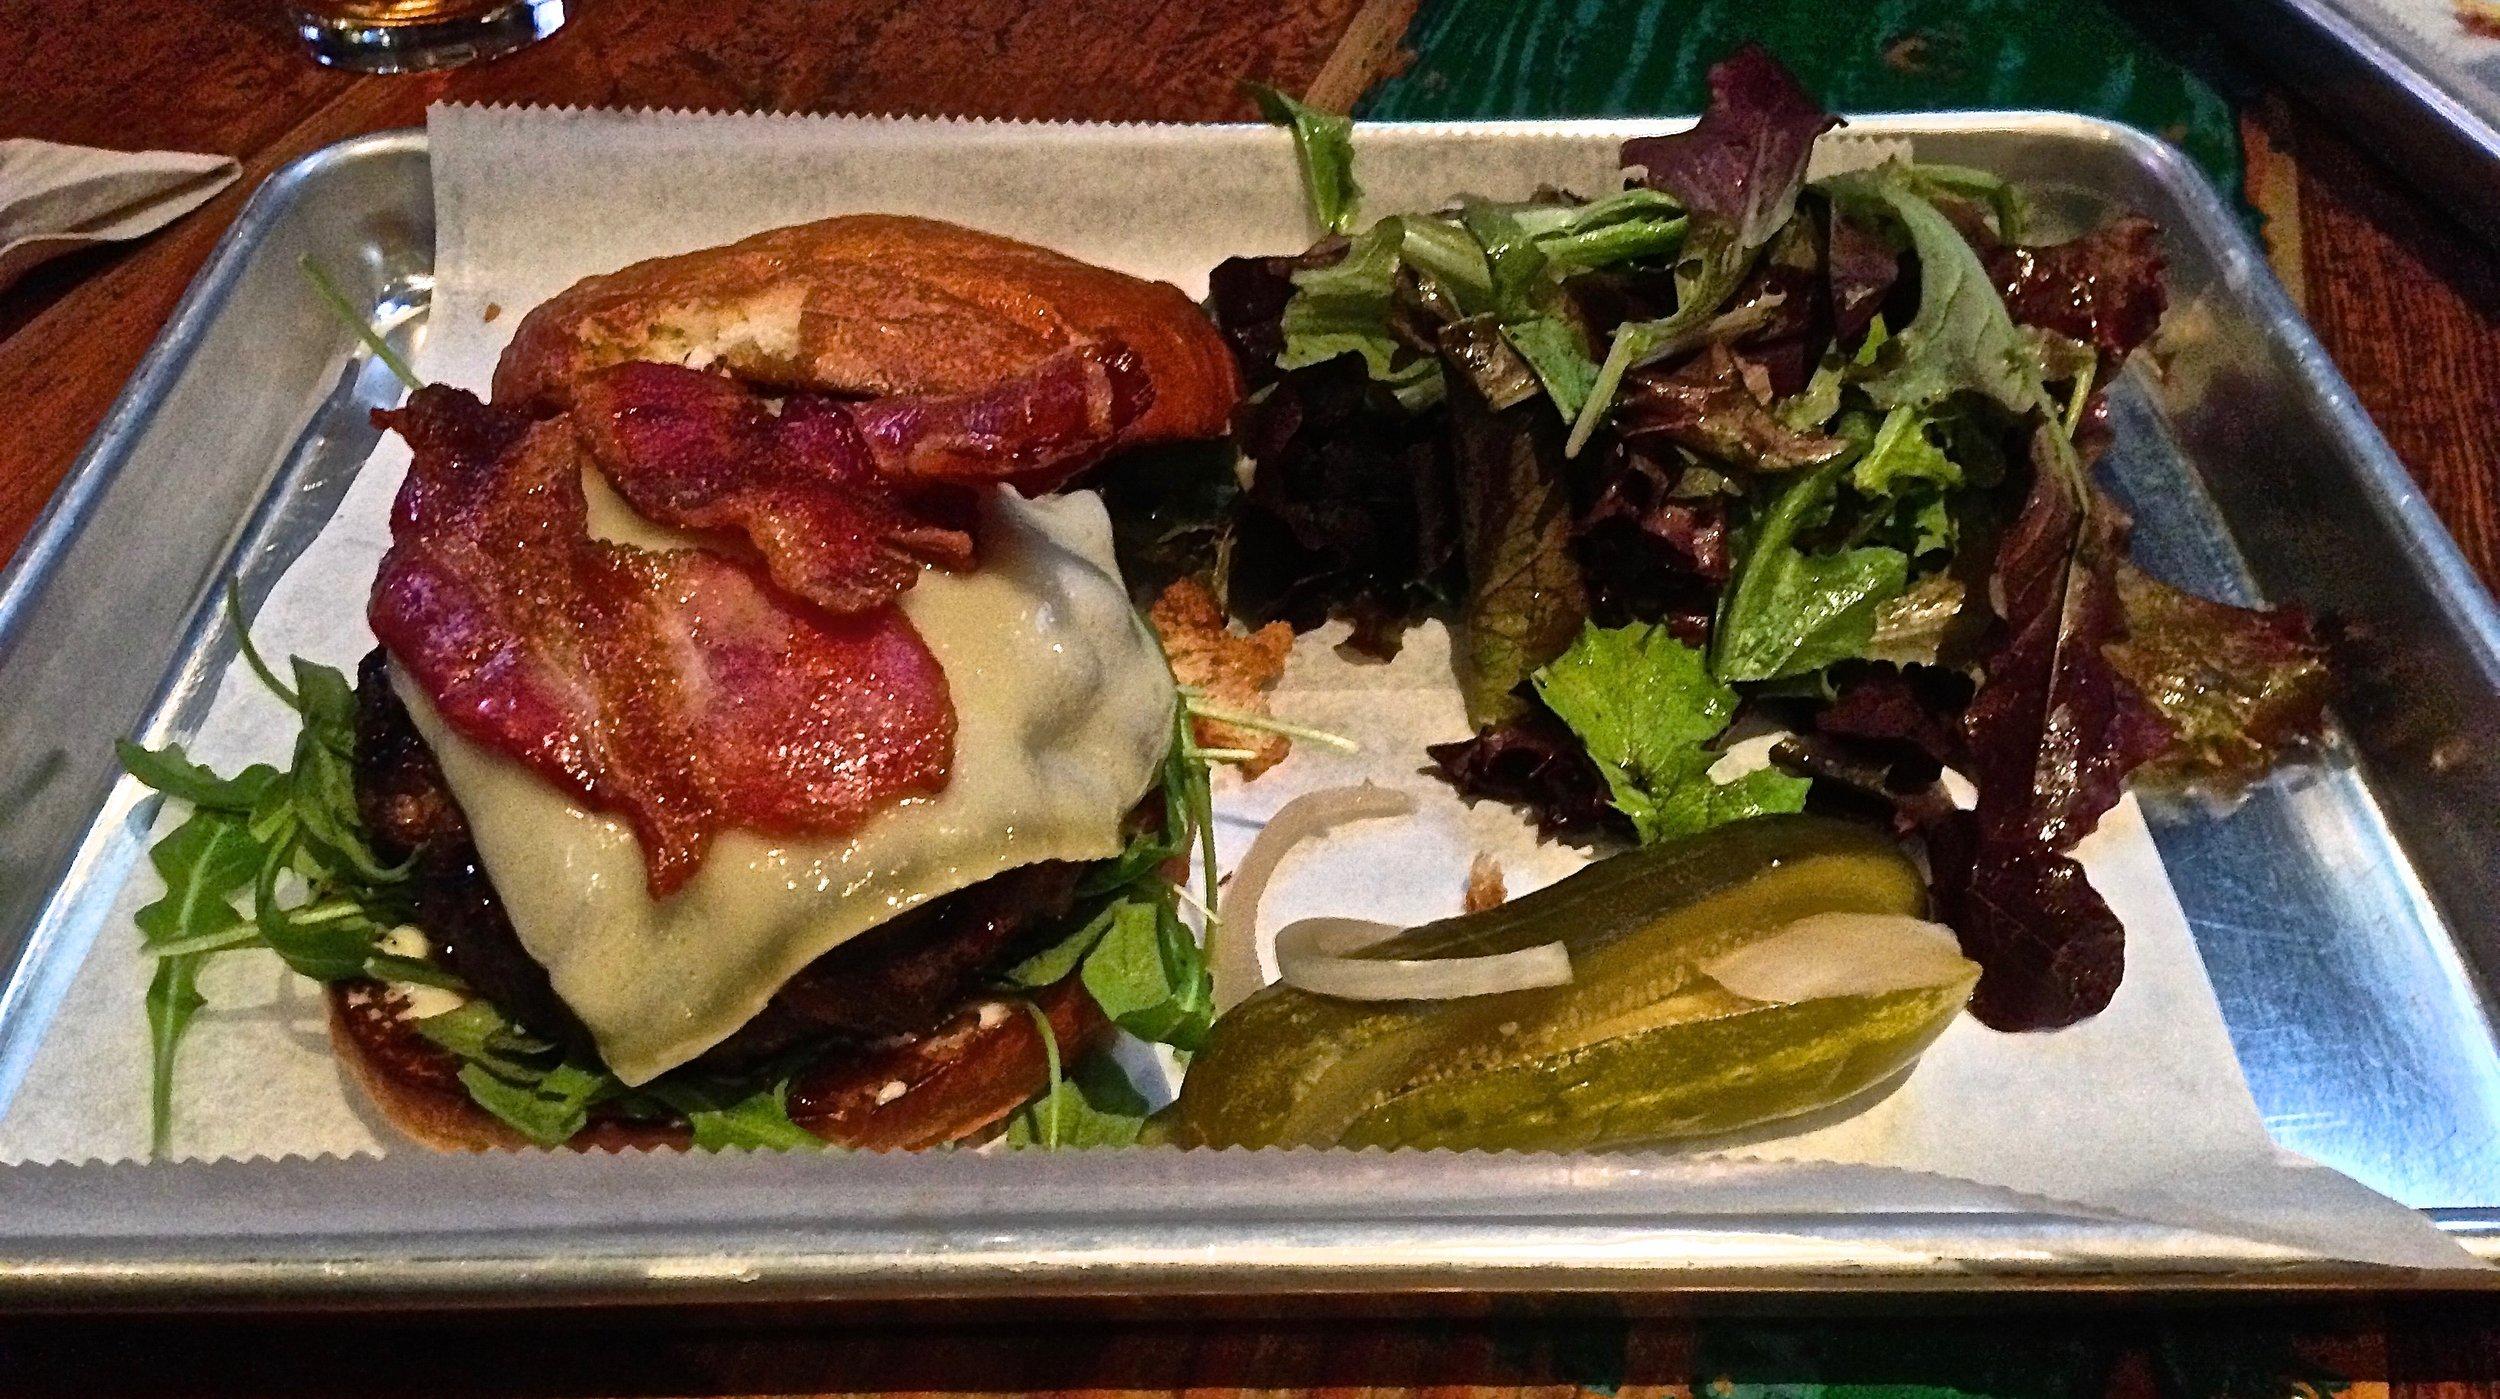 Hi Tops bacon cheeseburger